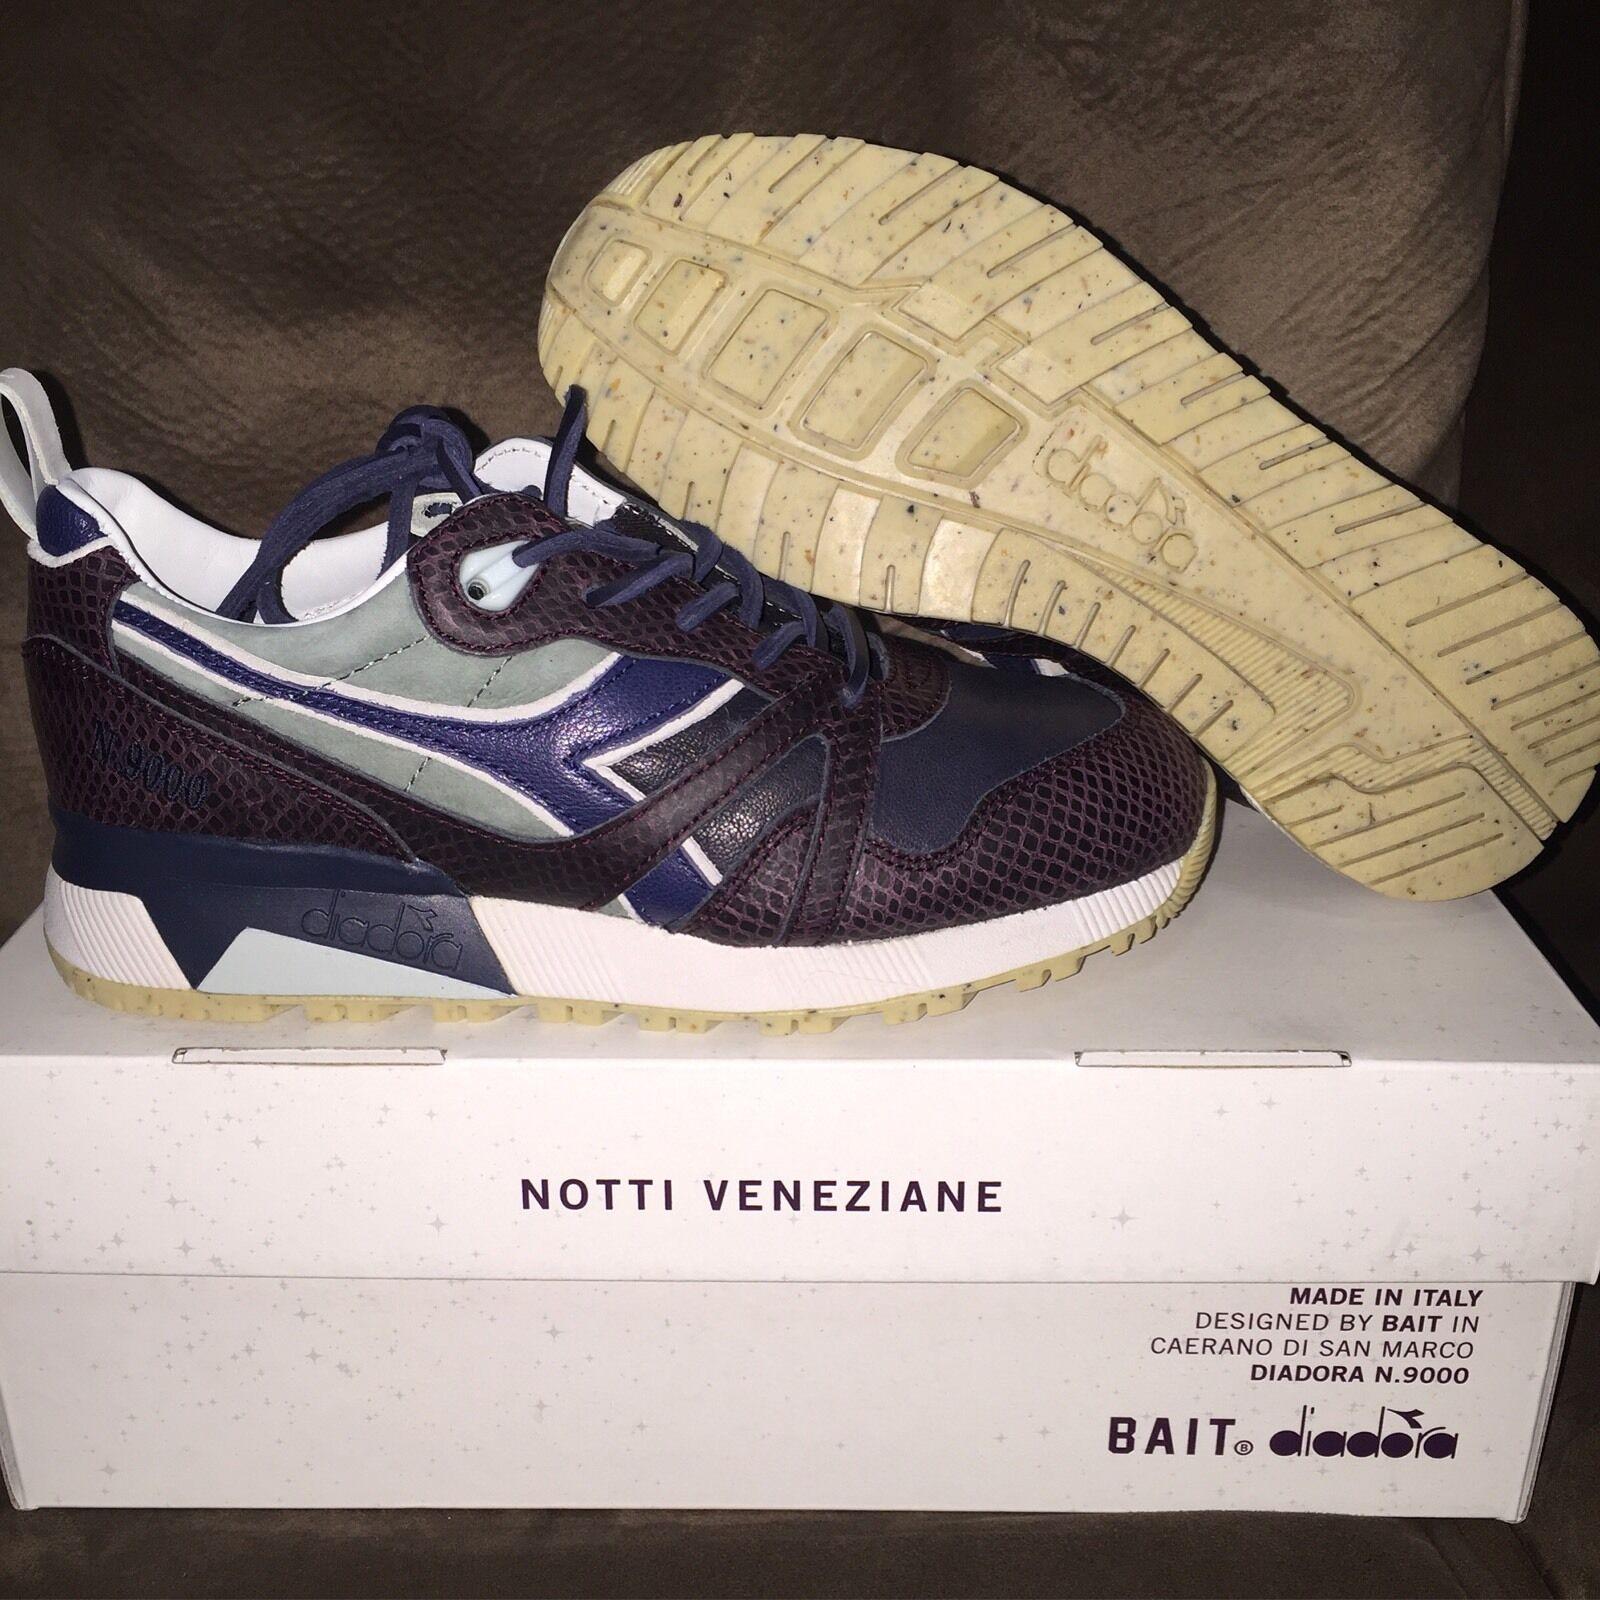 a94f718c1a Bait x N9000 5 Diadora Size nvqejj7165-Athletic Shoes - www ...